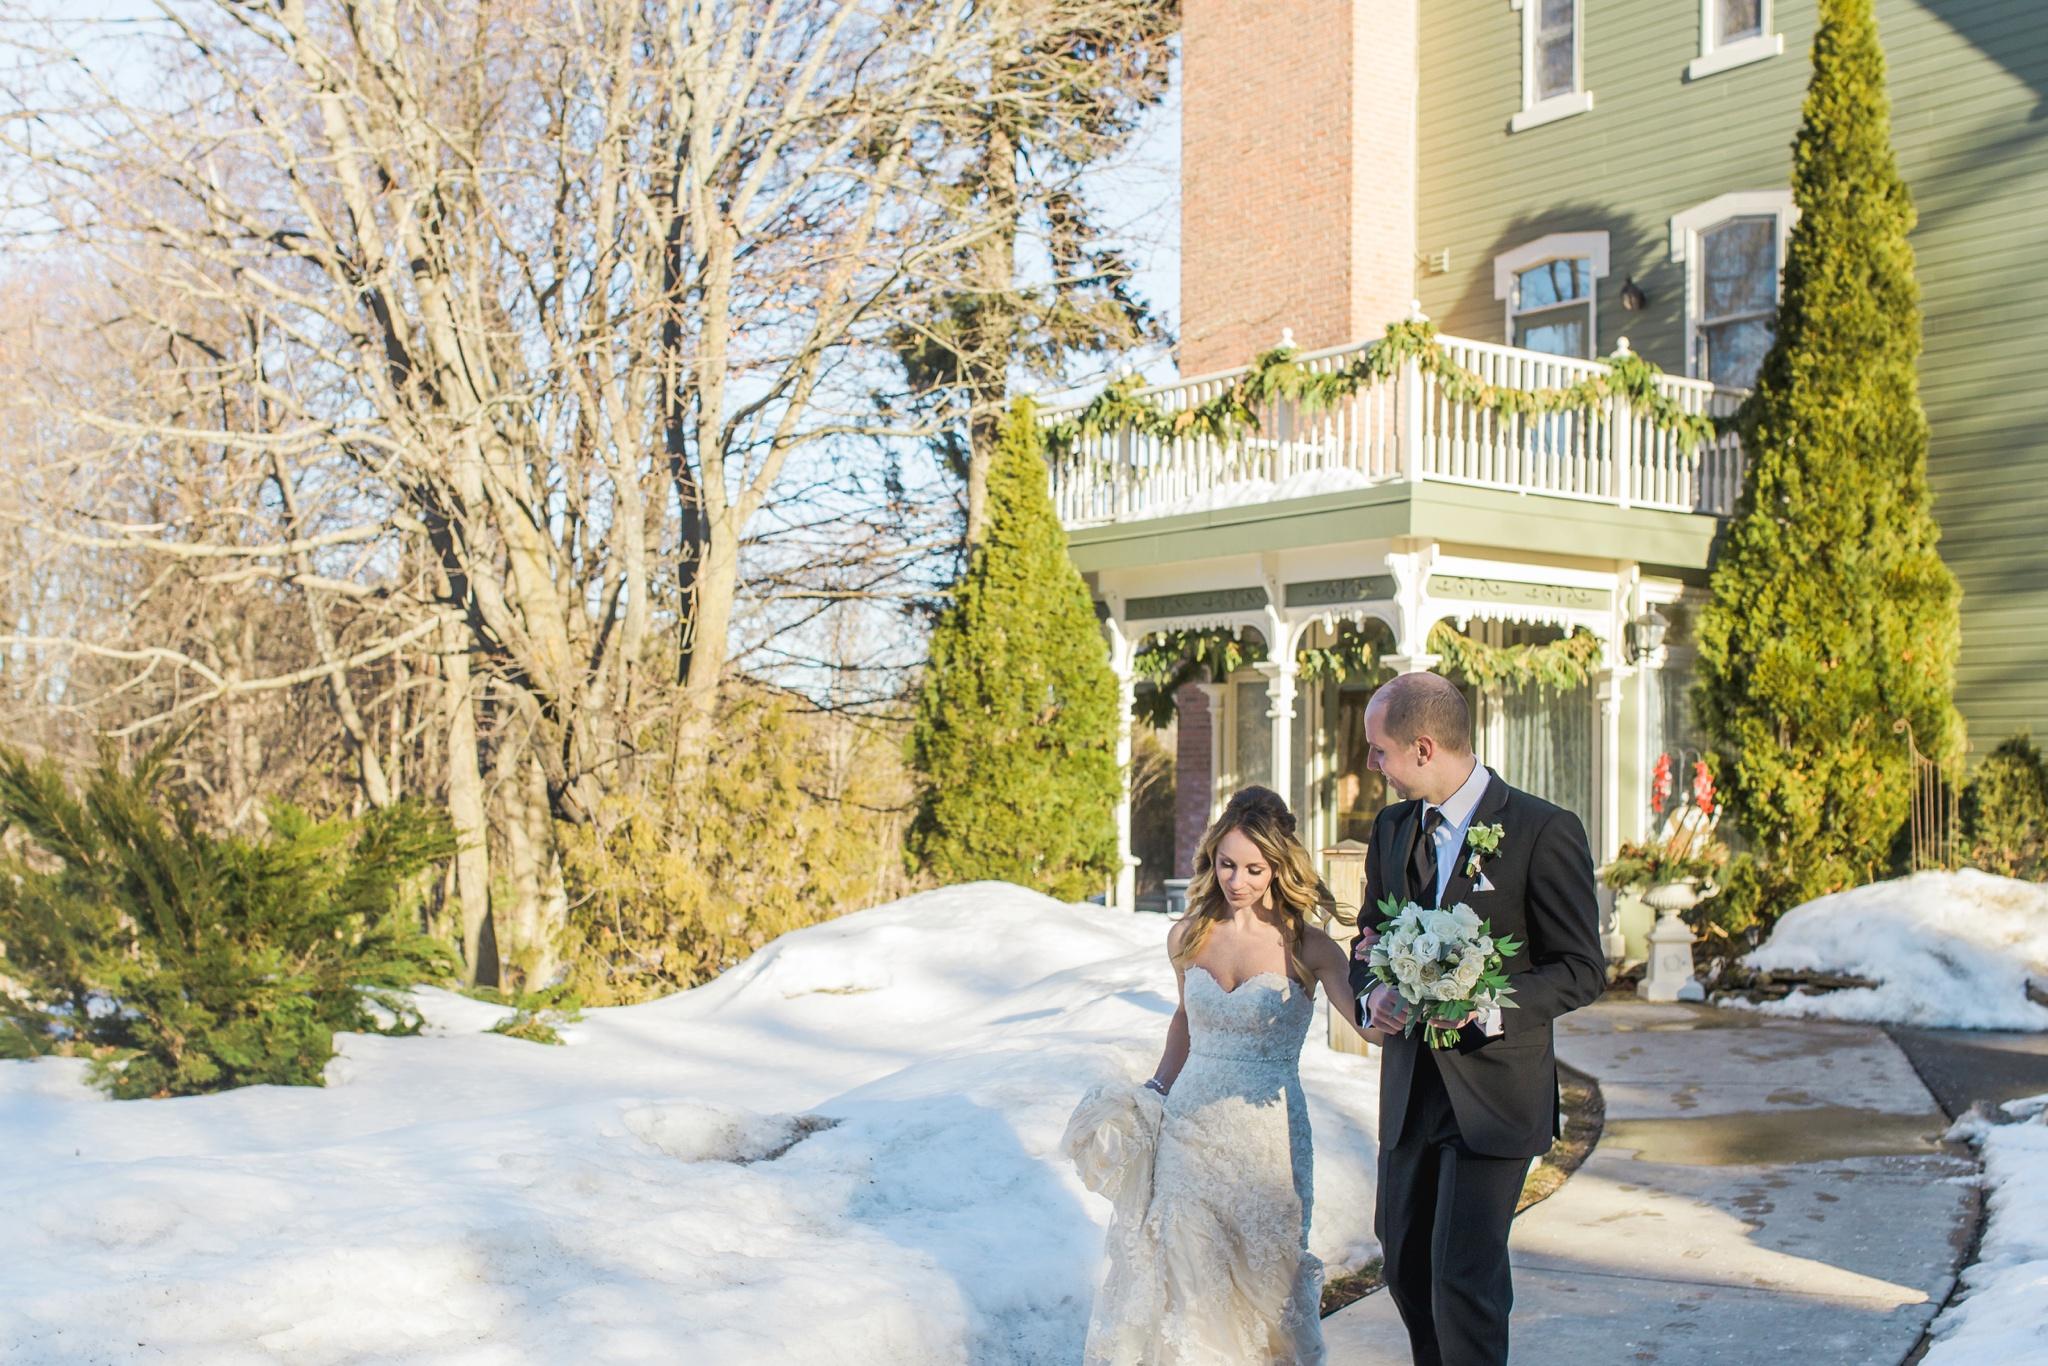 winter wedding, toronto wedding photographer, durham region wedding photographer